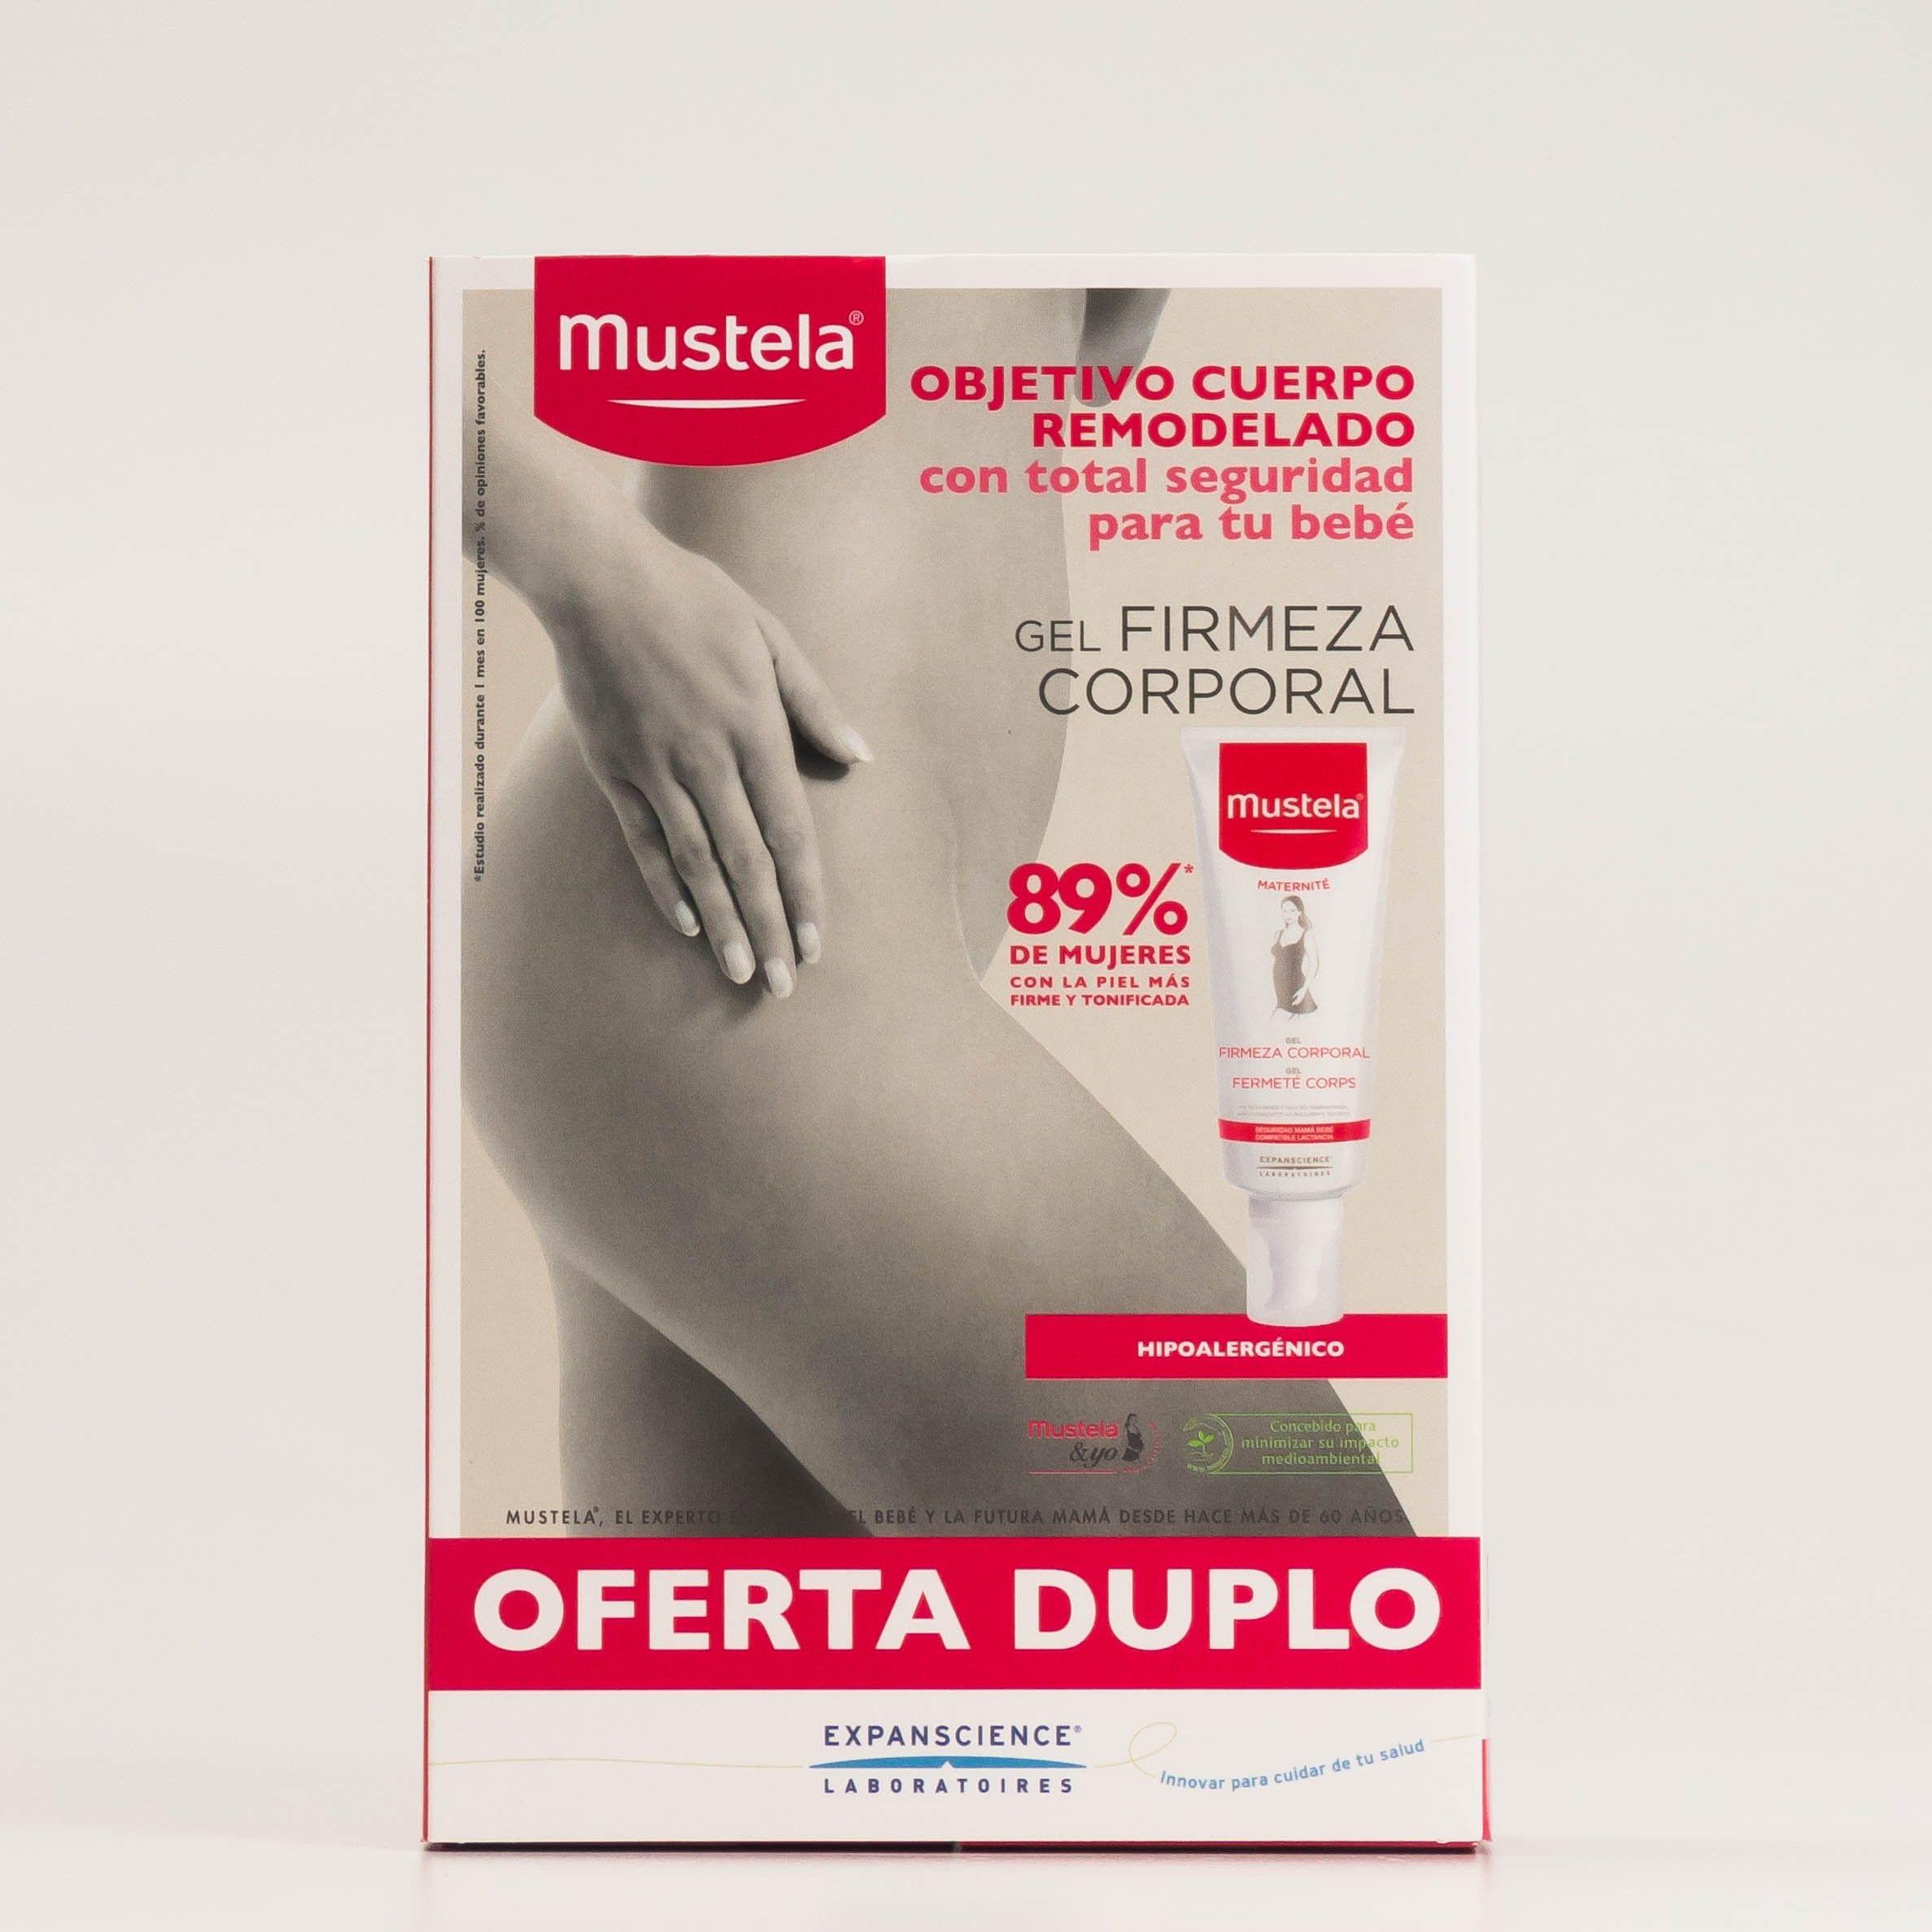 Mustela Gel Firmeza Corporal DUPLO, 2x200 ml.